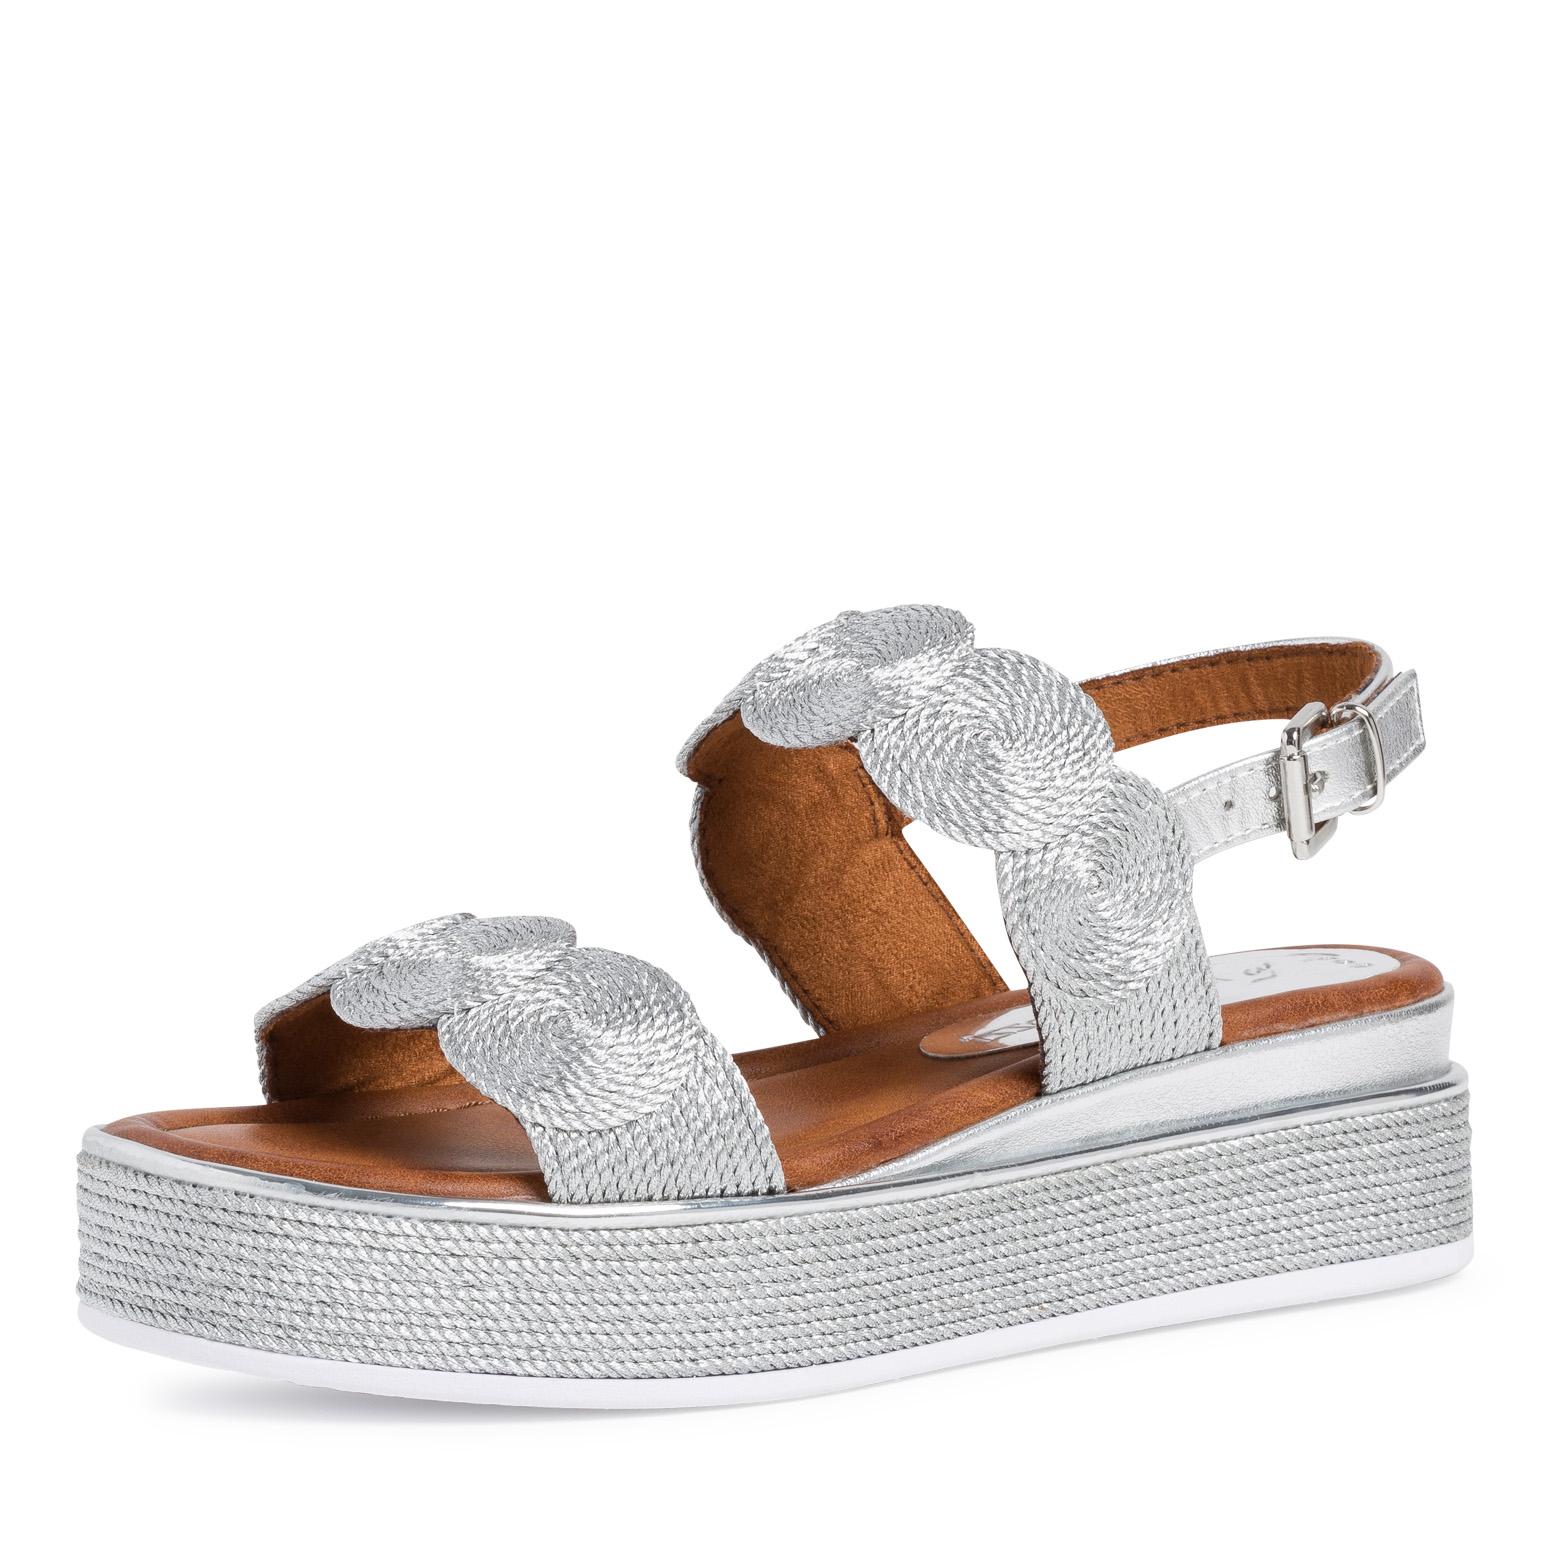 Sandale plateforme Marco Tozzi 28760 941